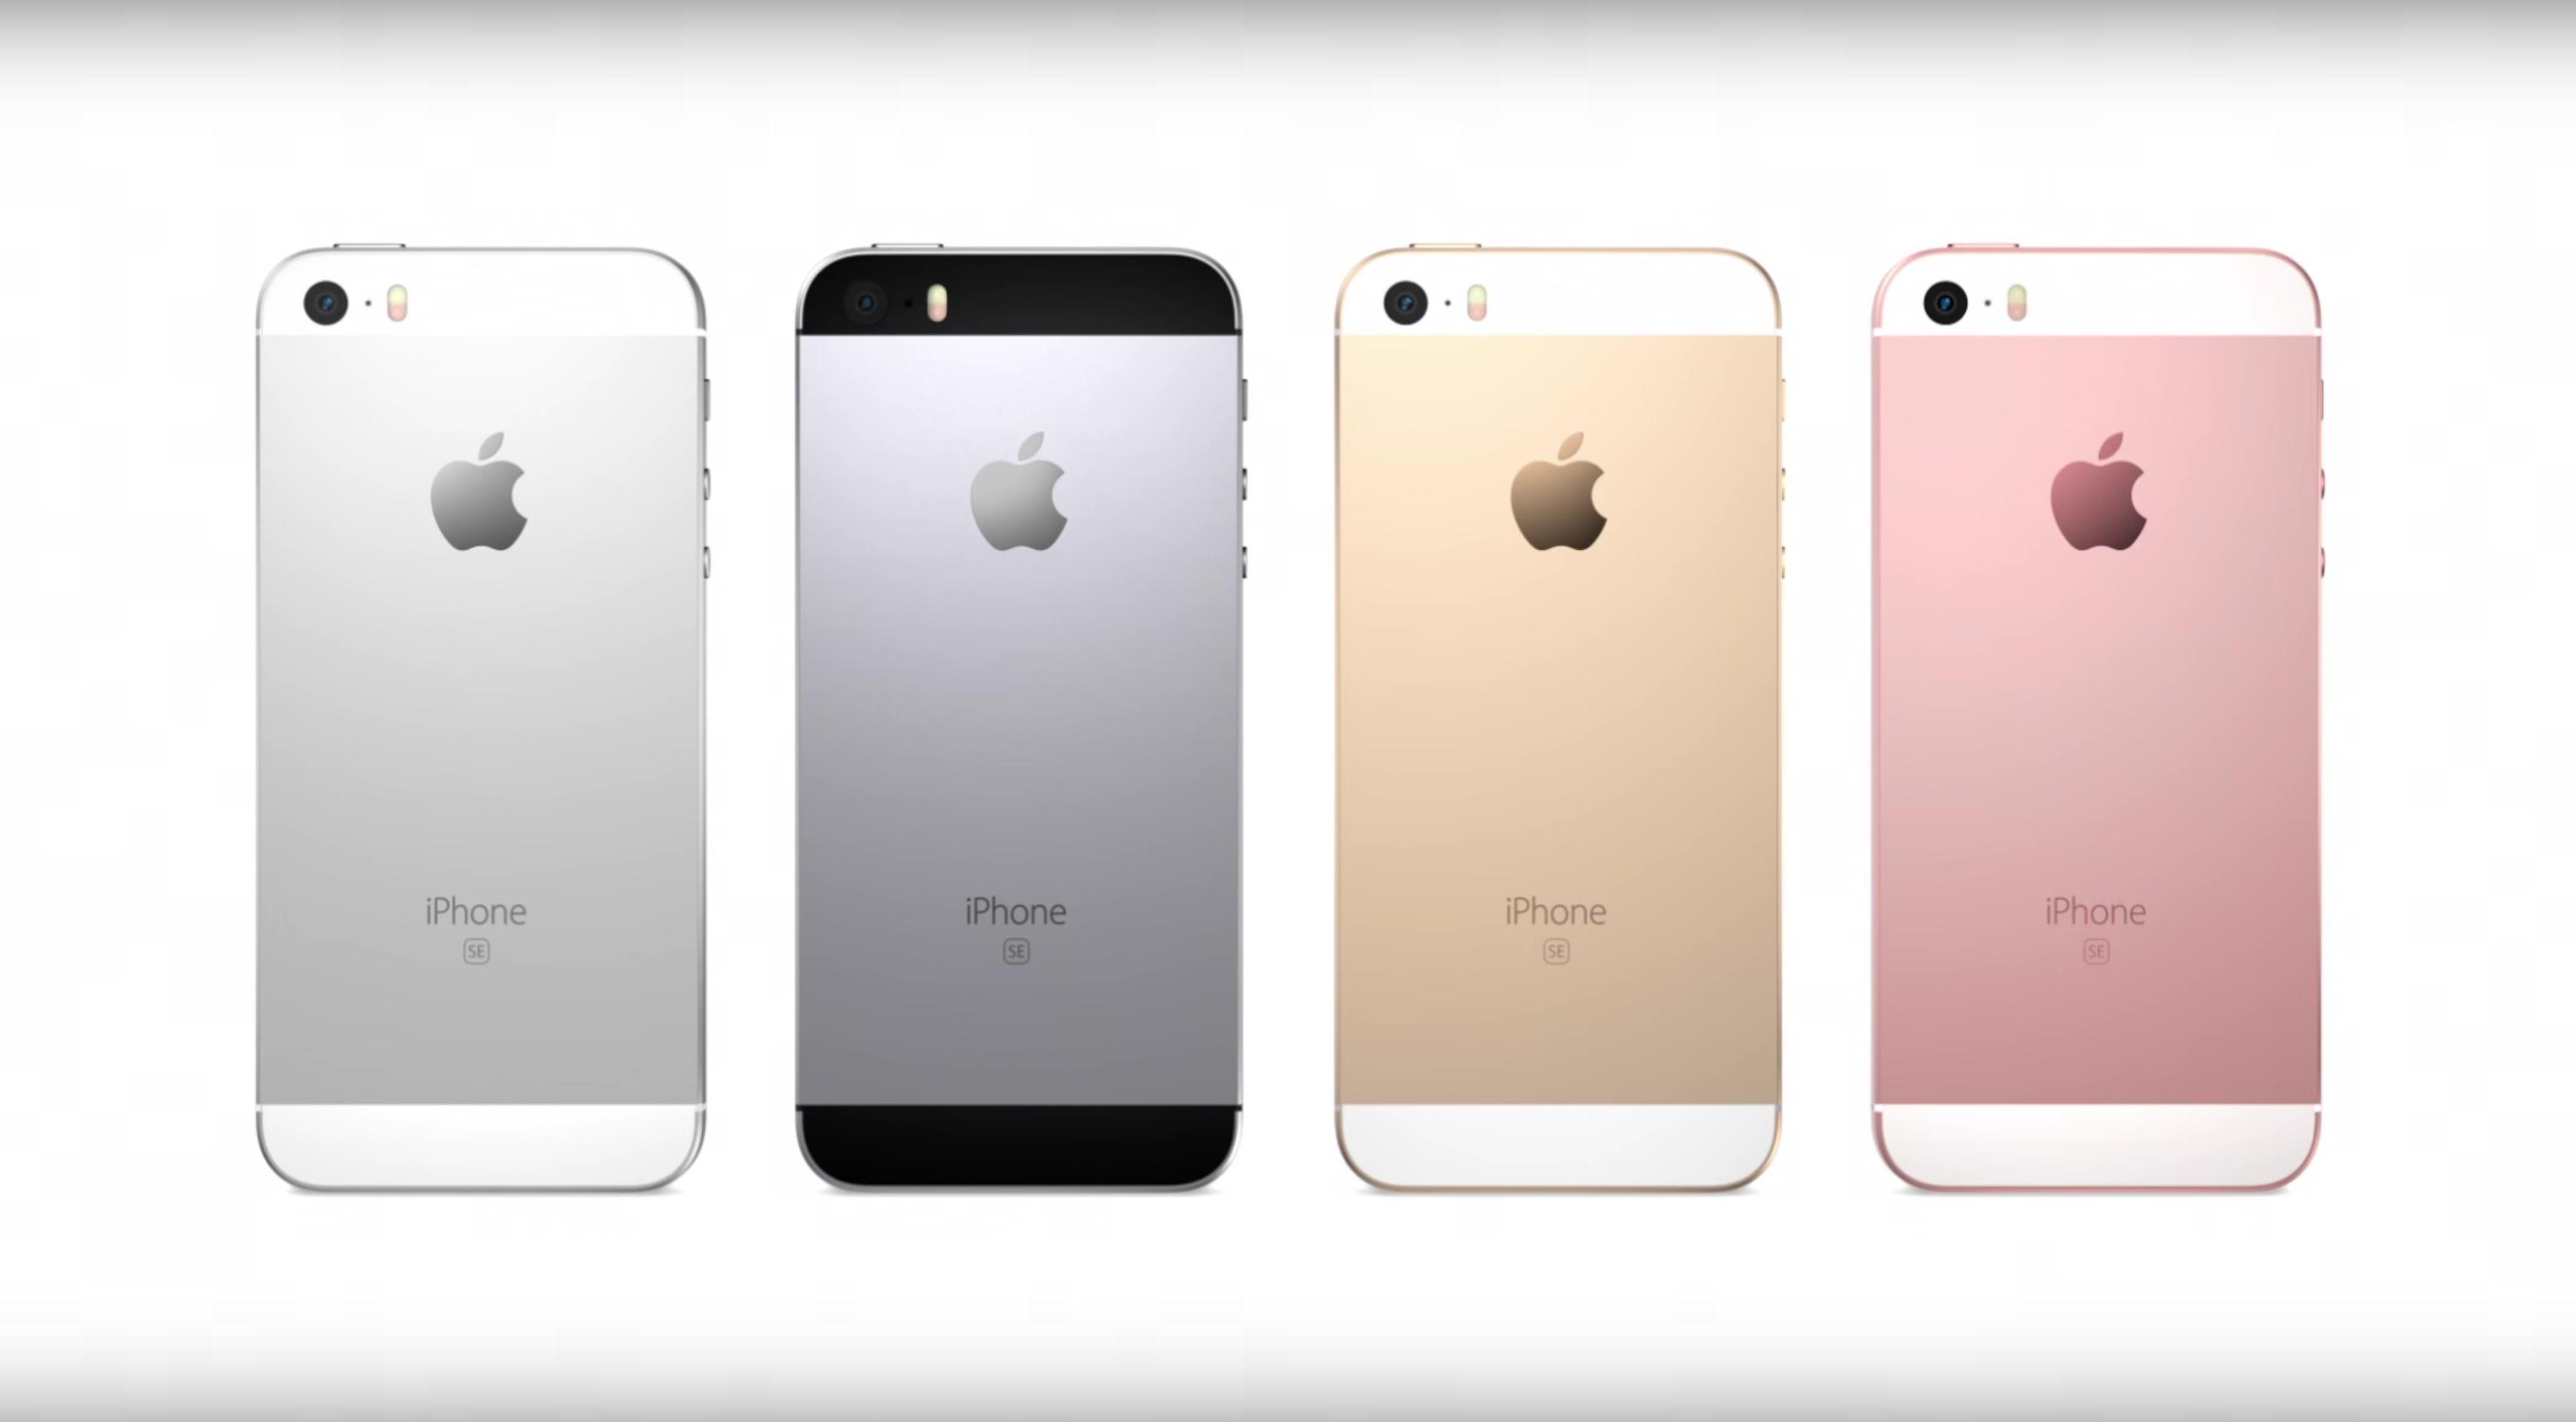 Neues Iphone Vorgestellt